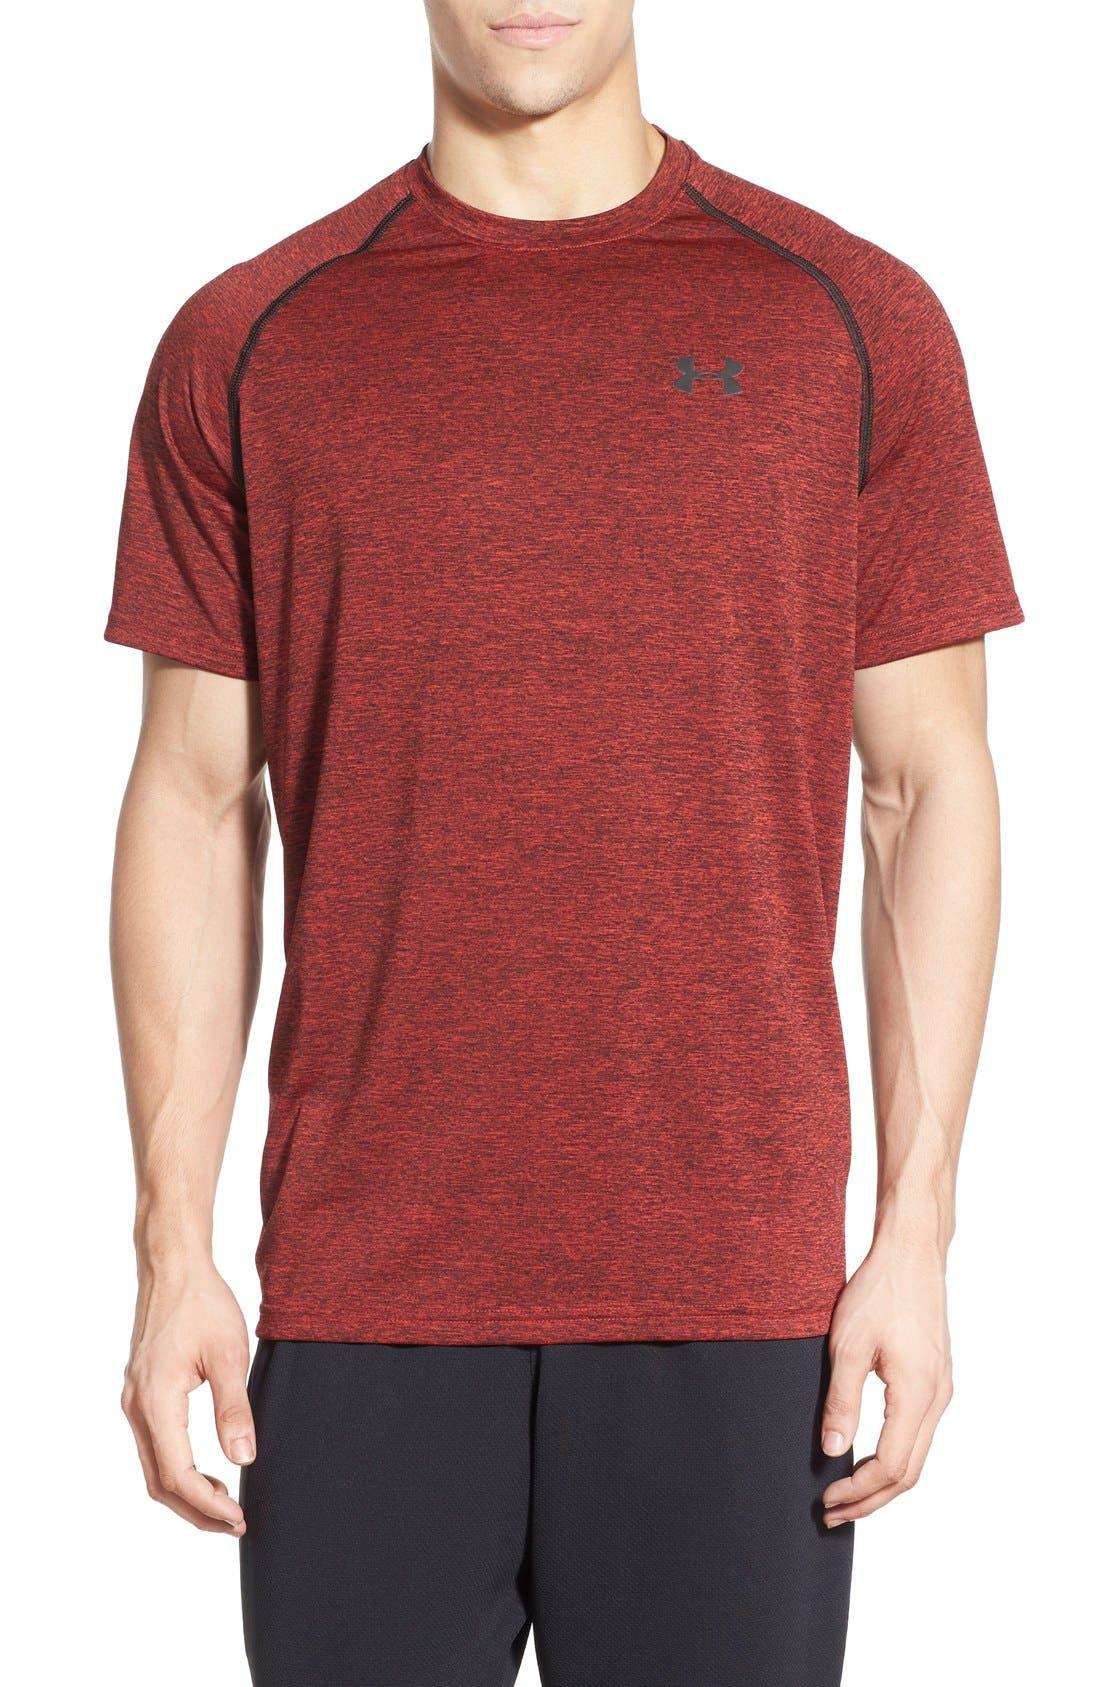 Main Image - Under Armour 'UA Tech' Loose Fit Short Sleeve T-Shirt